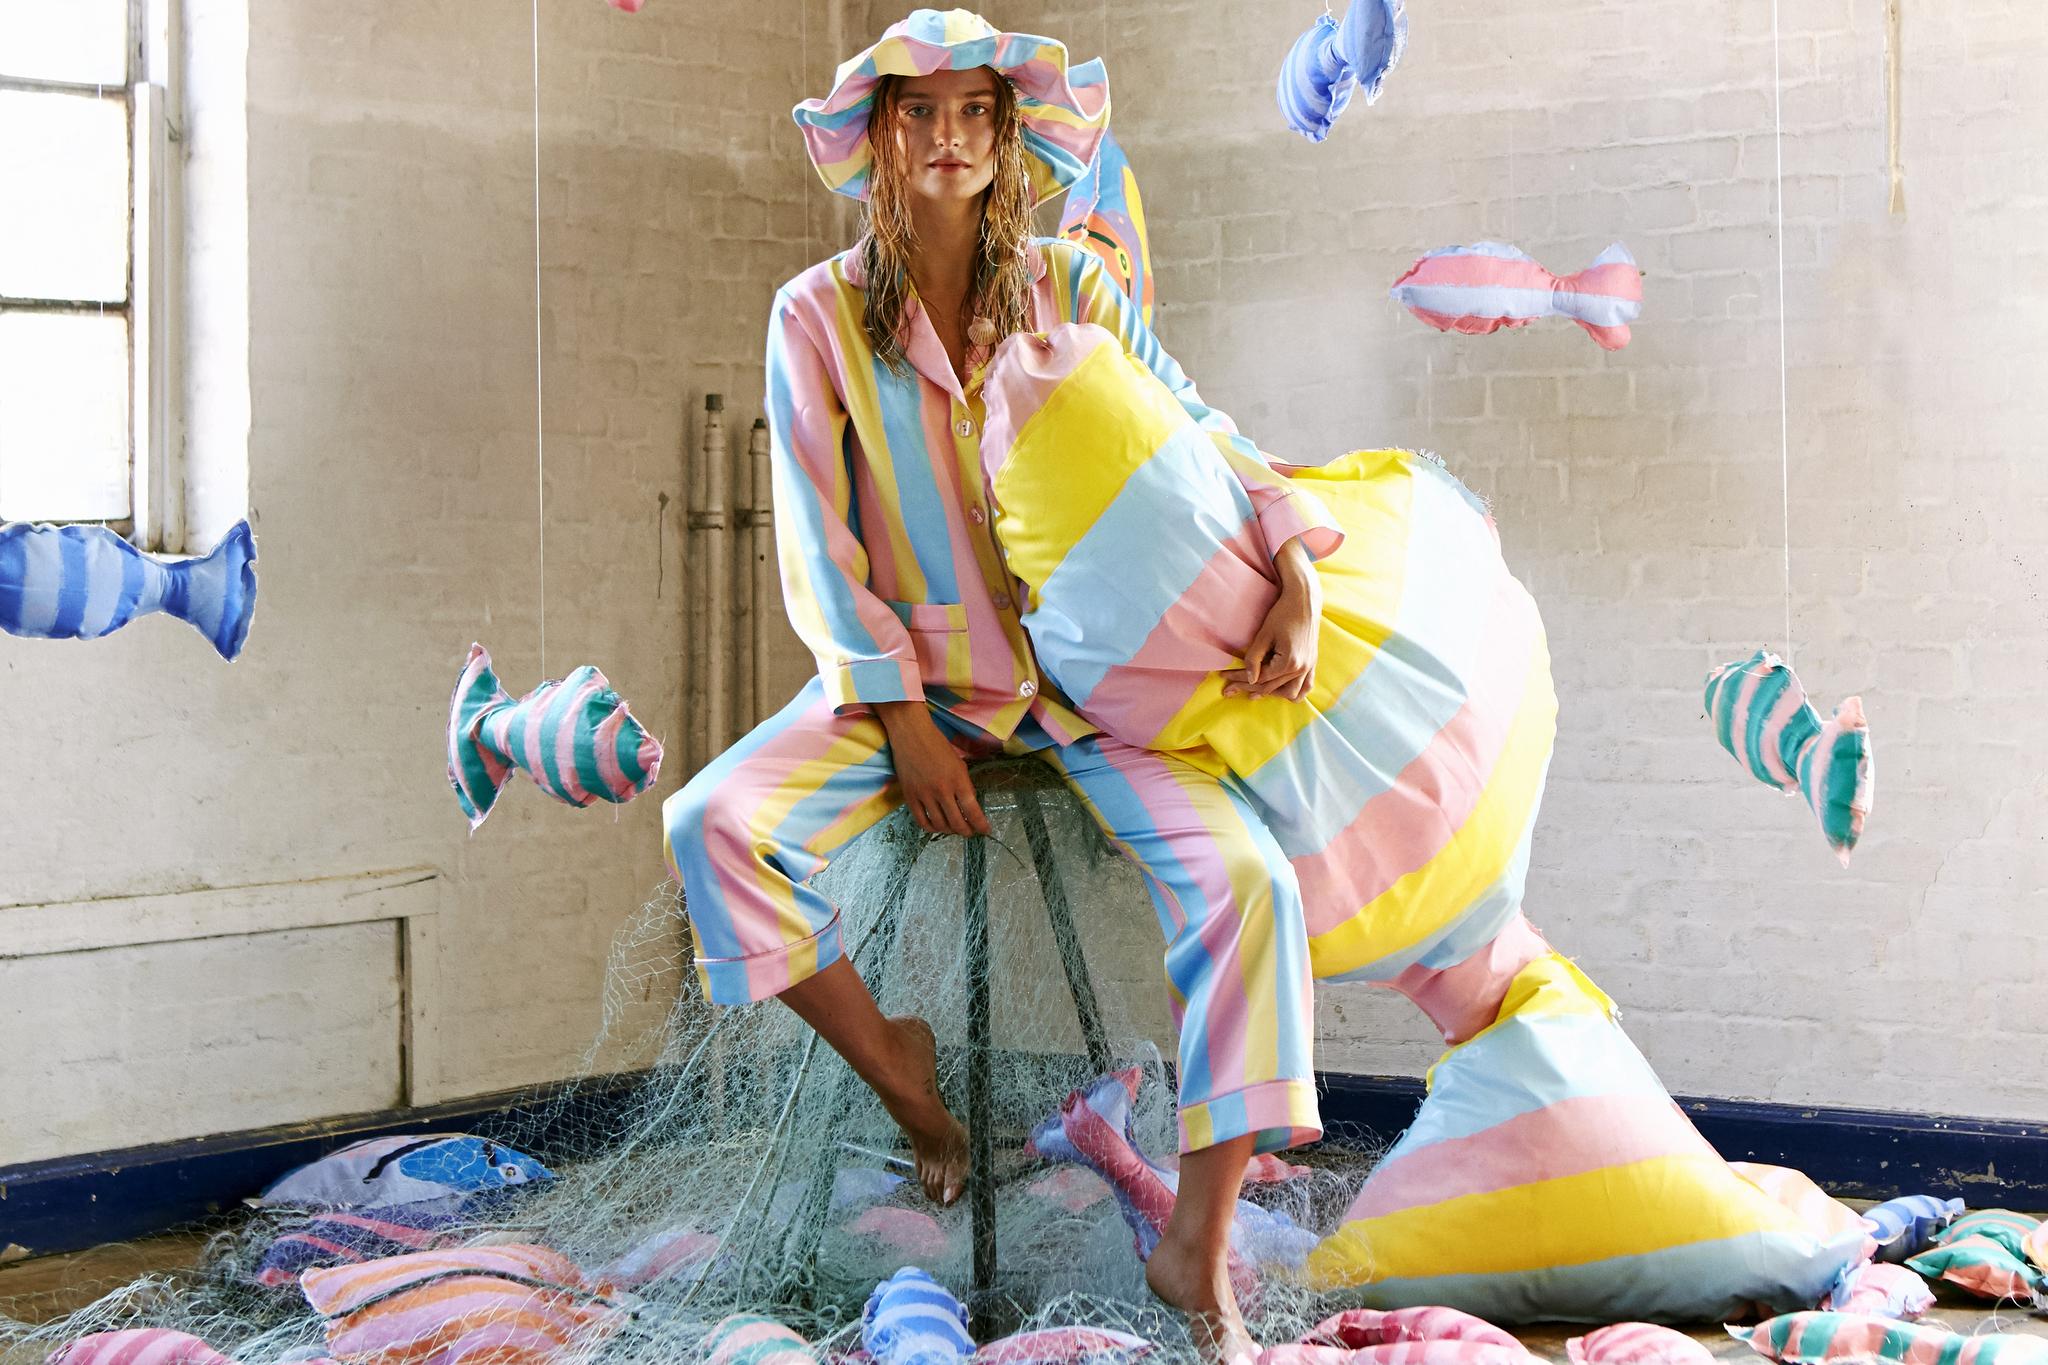 Copenhagen designer Emilie Helmstedt's fairy tale-inspired debut collection.